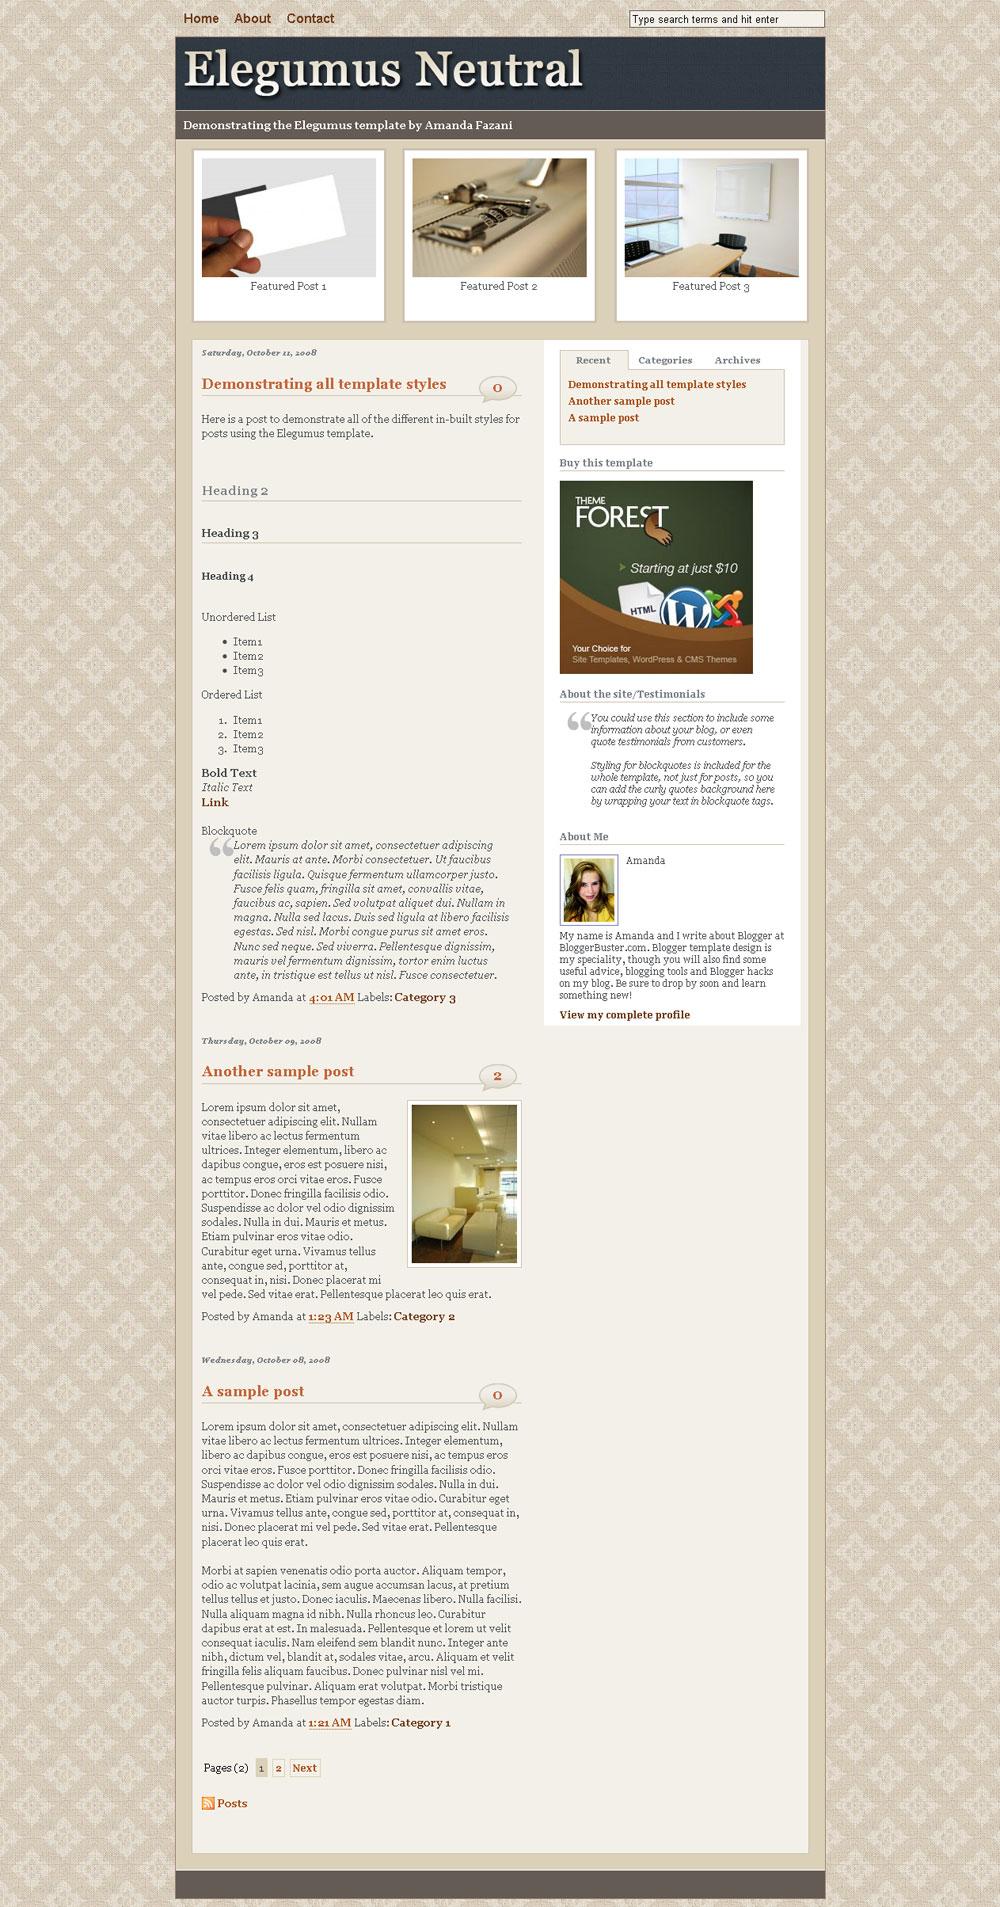 http://2.s3.envato.com/files/52041/screenshots/1_Elegumus-Neutral-Home.jpg